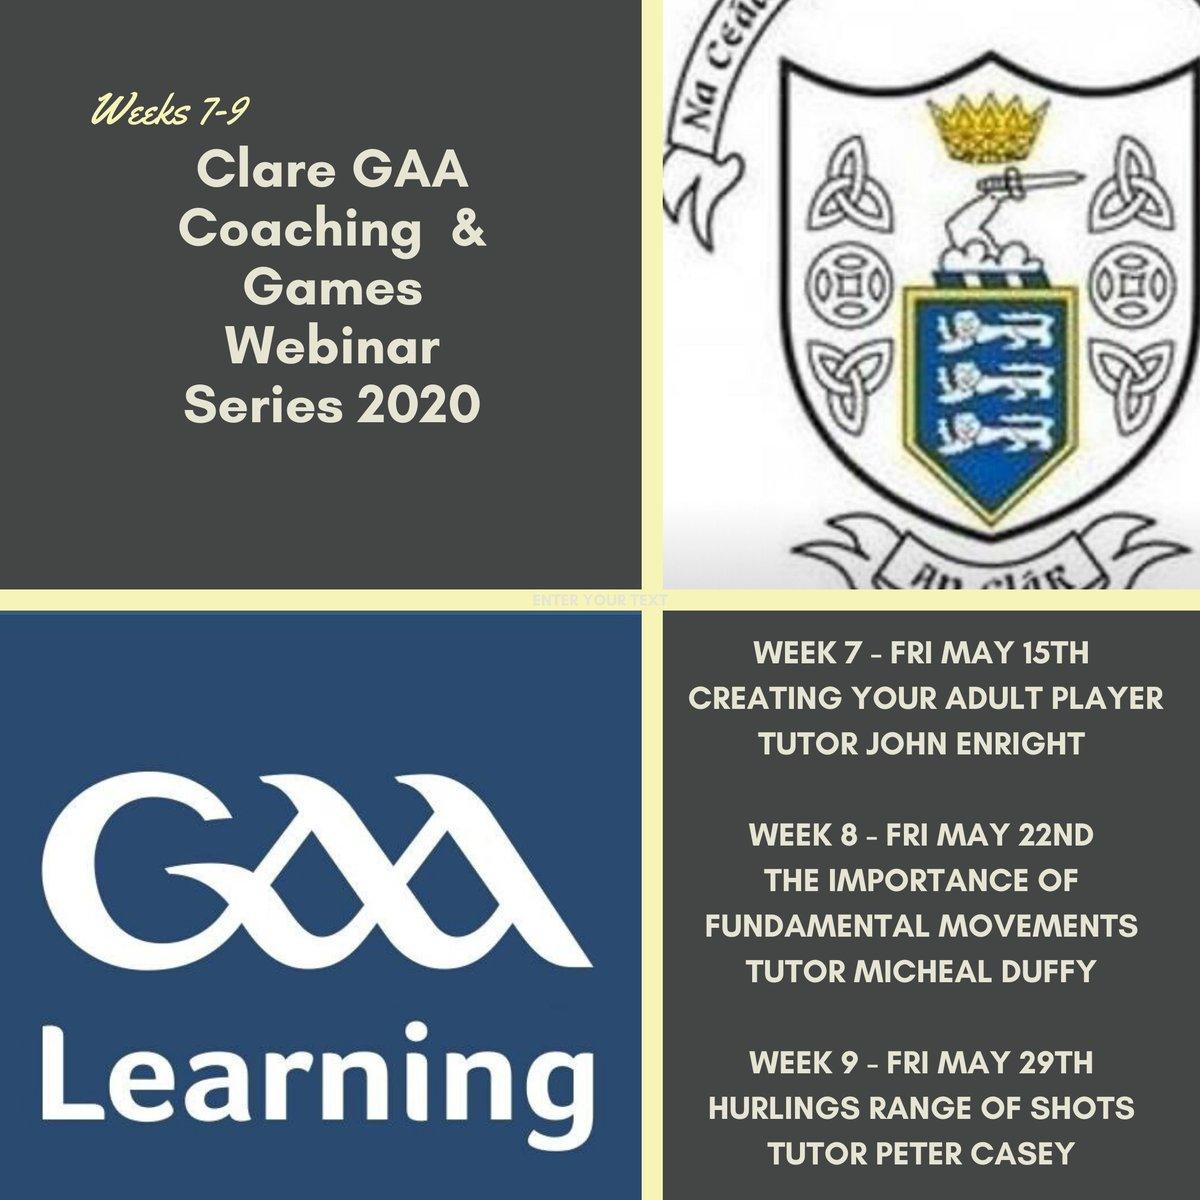 Coaching Courses & Workshops - Ladies Gaelic Football